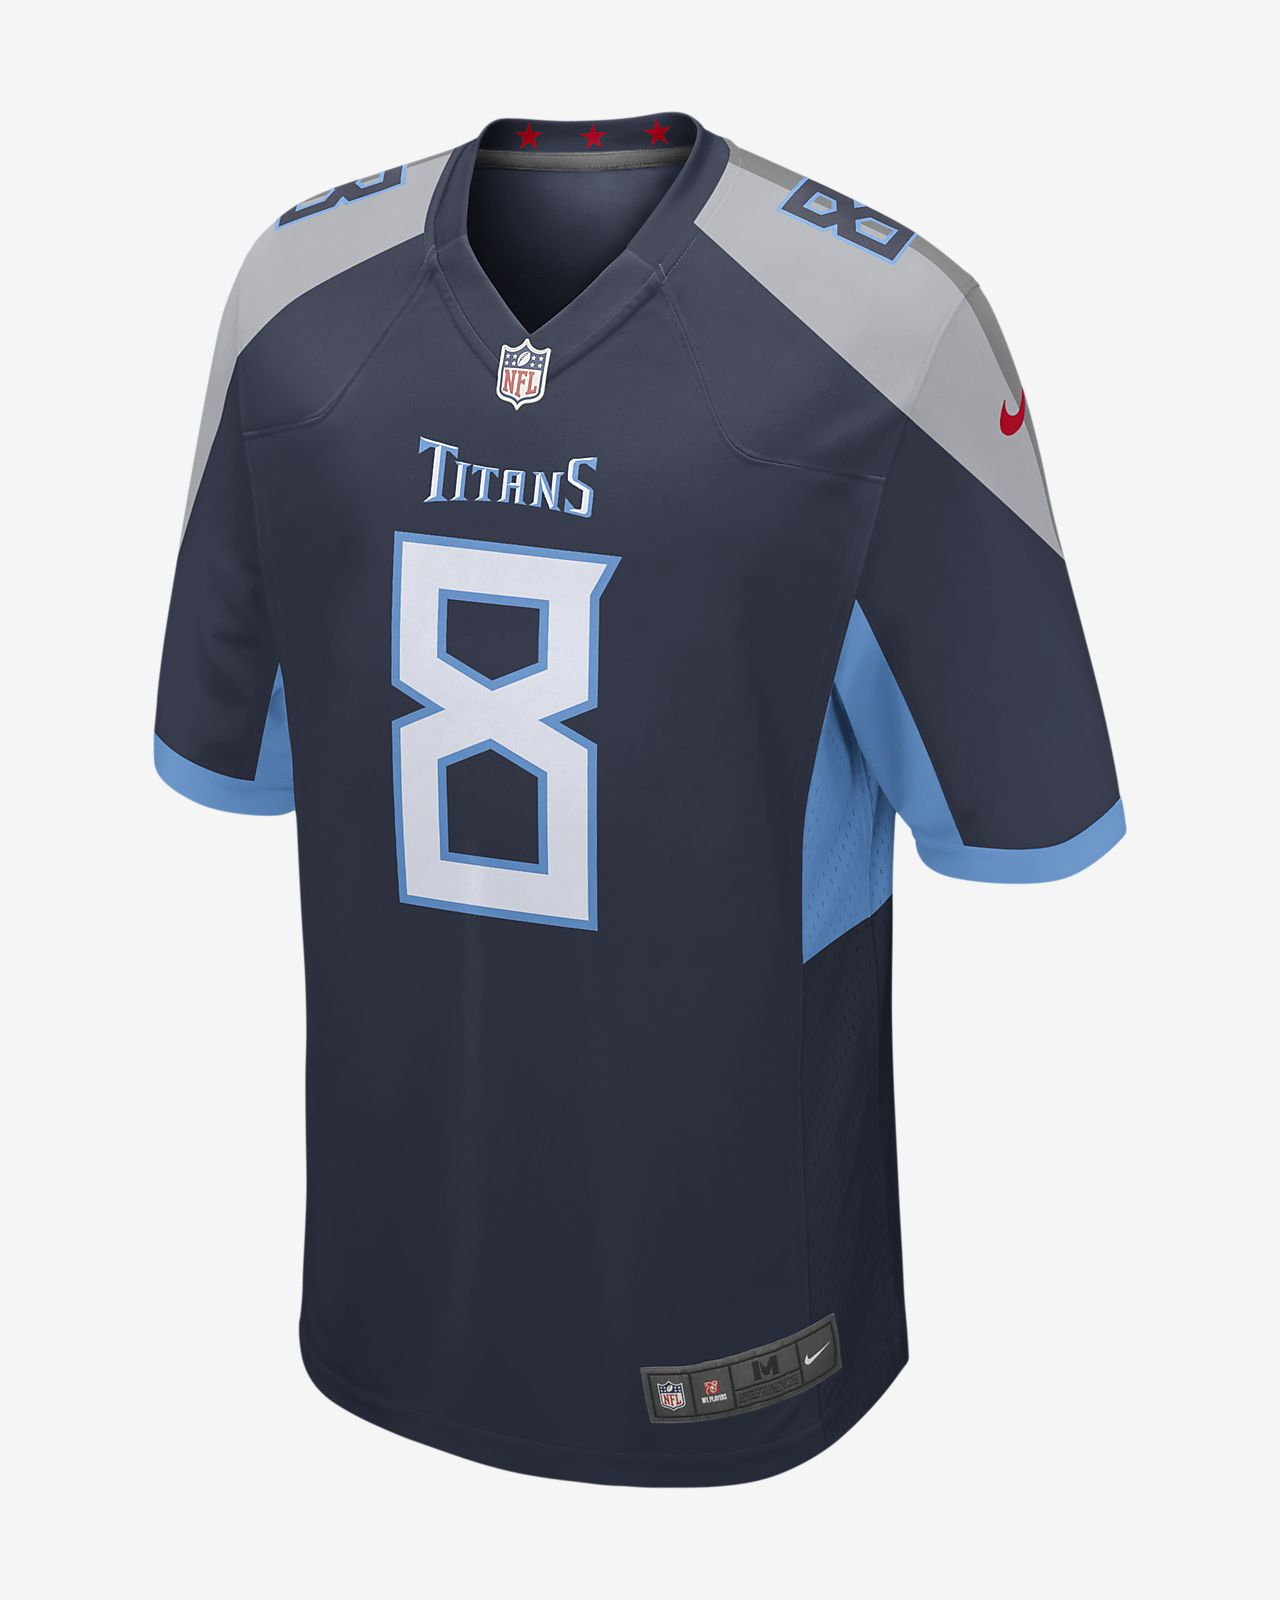 Męska koszulka do futbolu amerykańskiego NFL Tennessee Titans Game Jersey (Marcus Mariota)